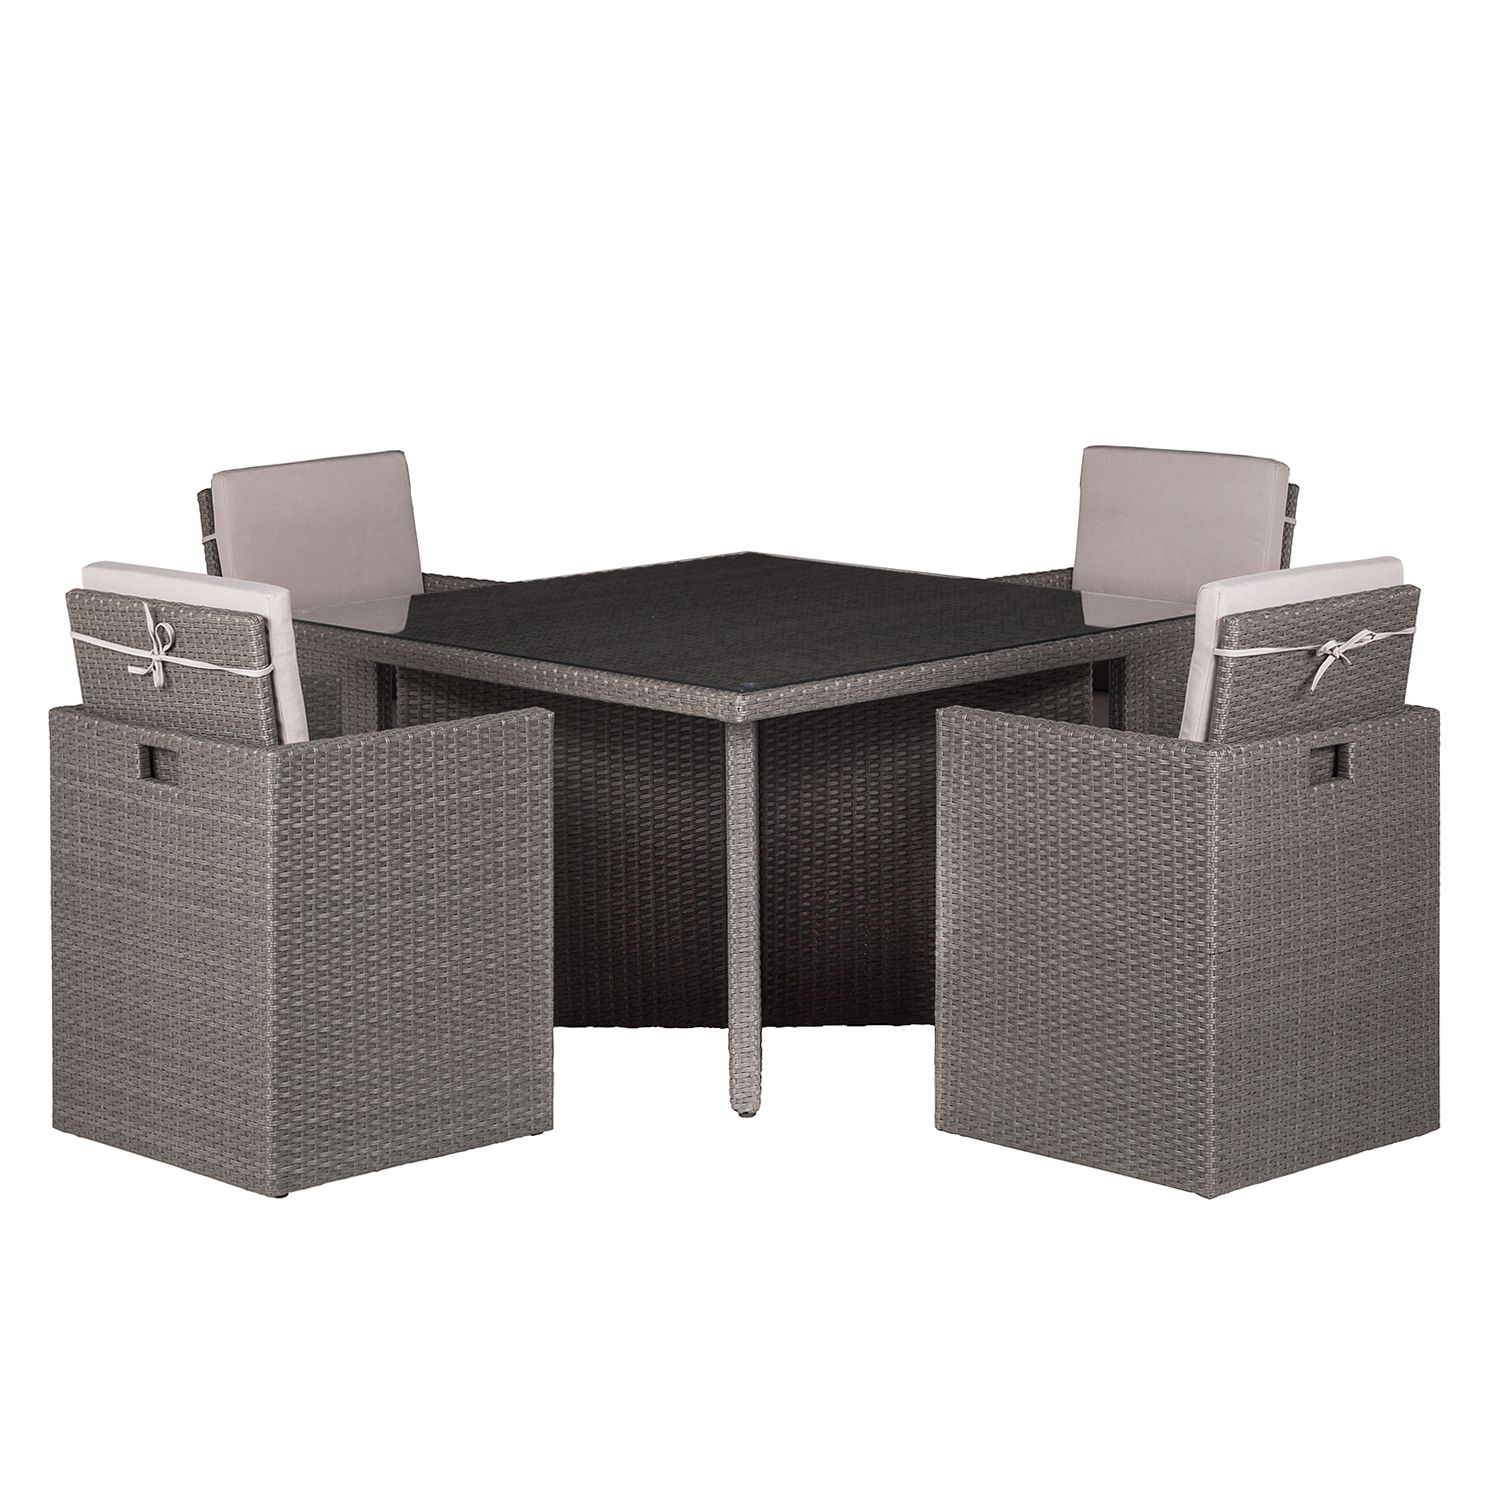 Sitzgruppe Paradise Lounge III (5-teilig) - Polyrattan / Webstoff - Grau / Beige, Kings Garden